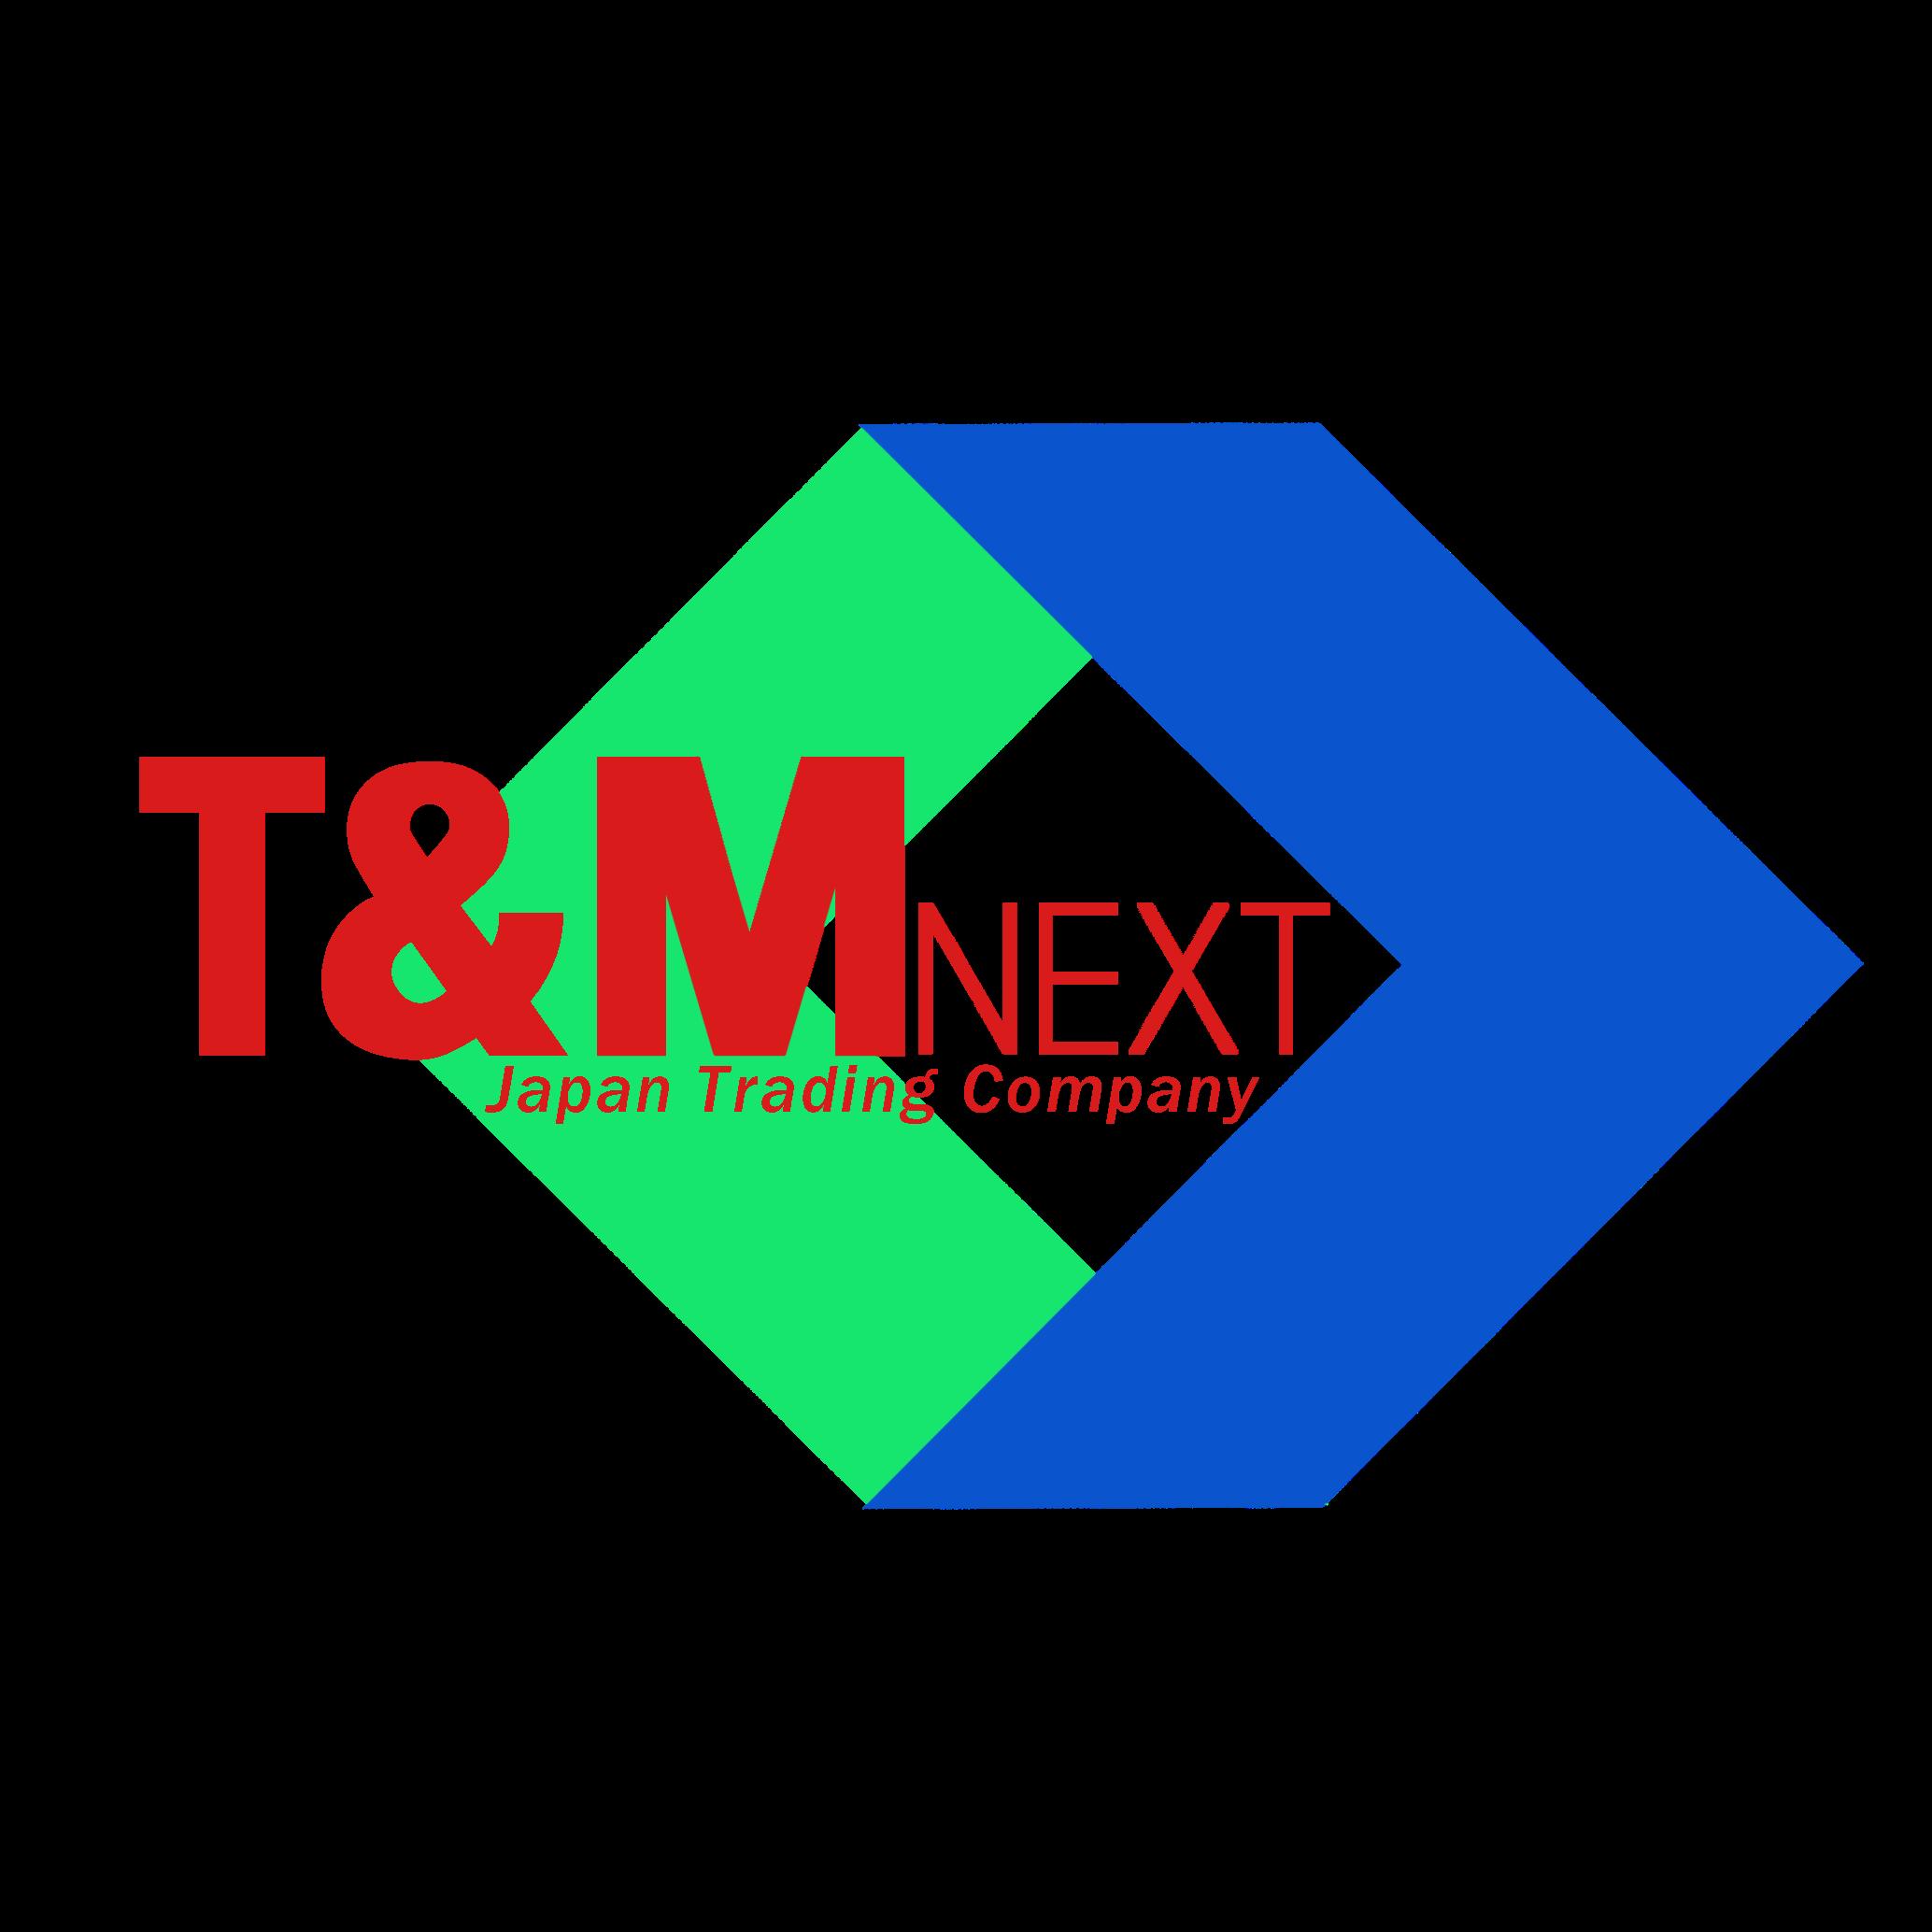 T&M Next